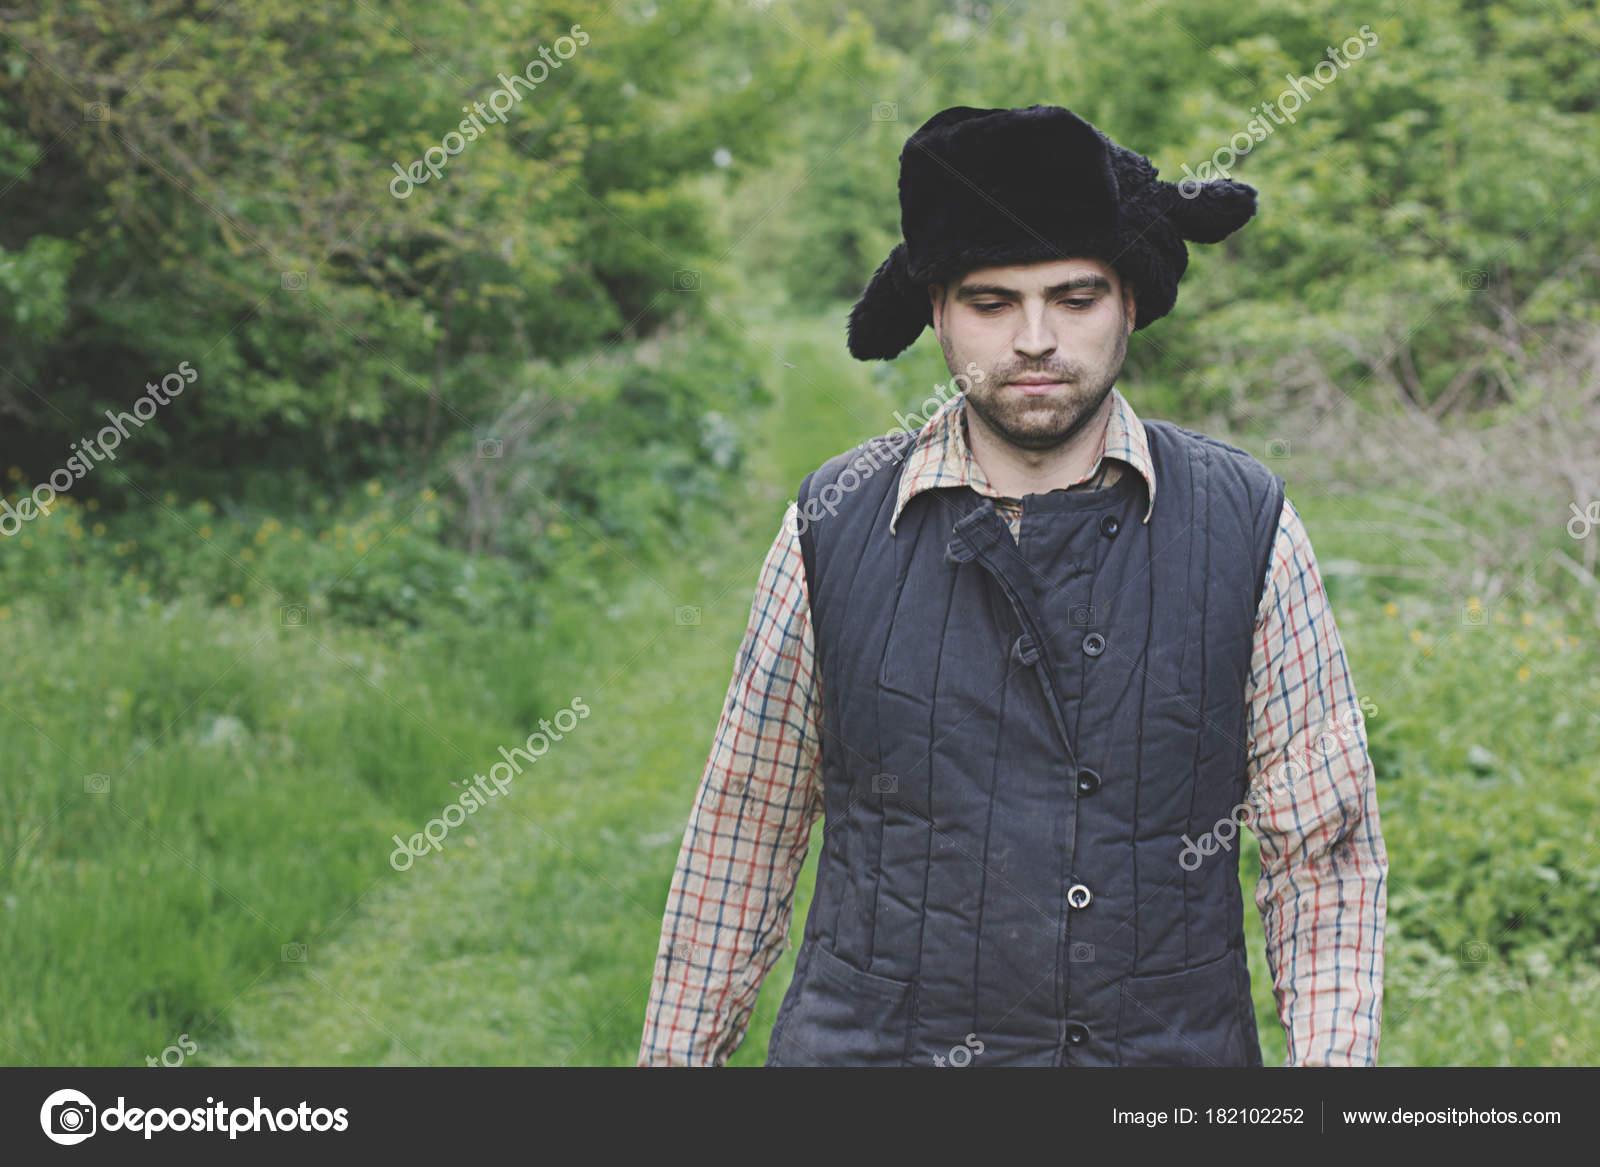 leñador en el sombrero — Foto de stock © solstudio  182102252 6a5649f791b